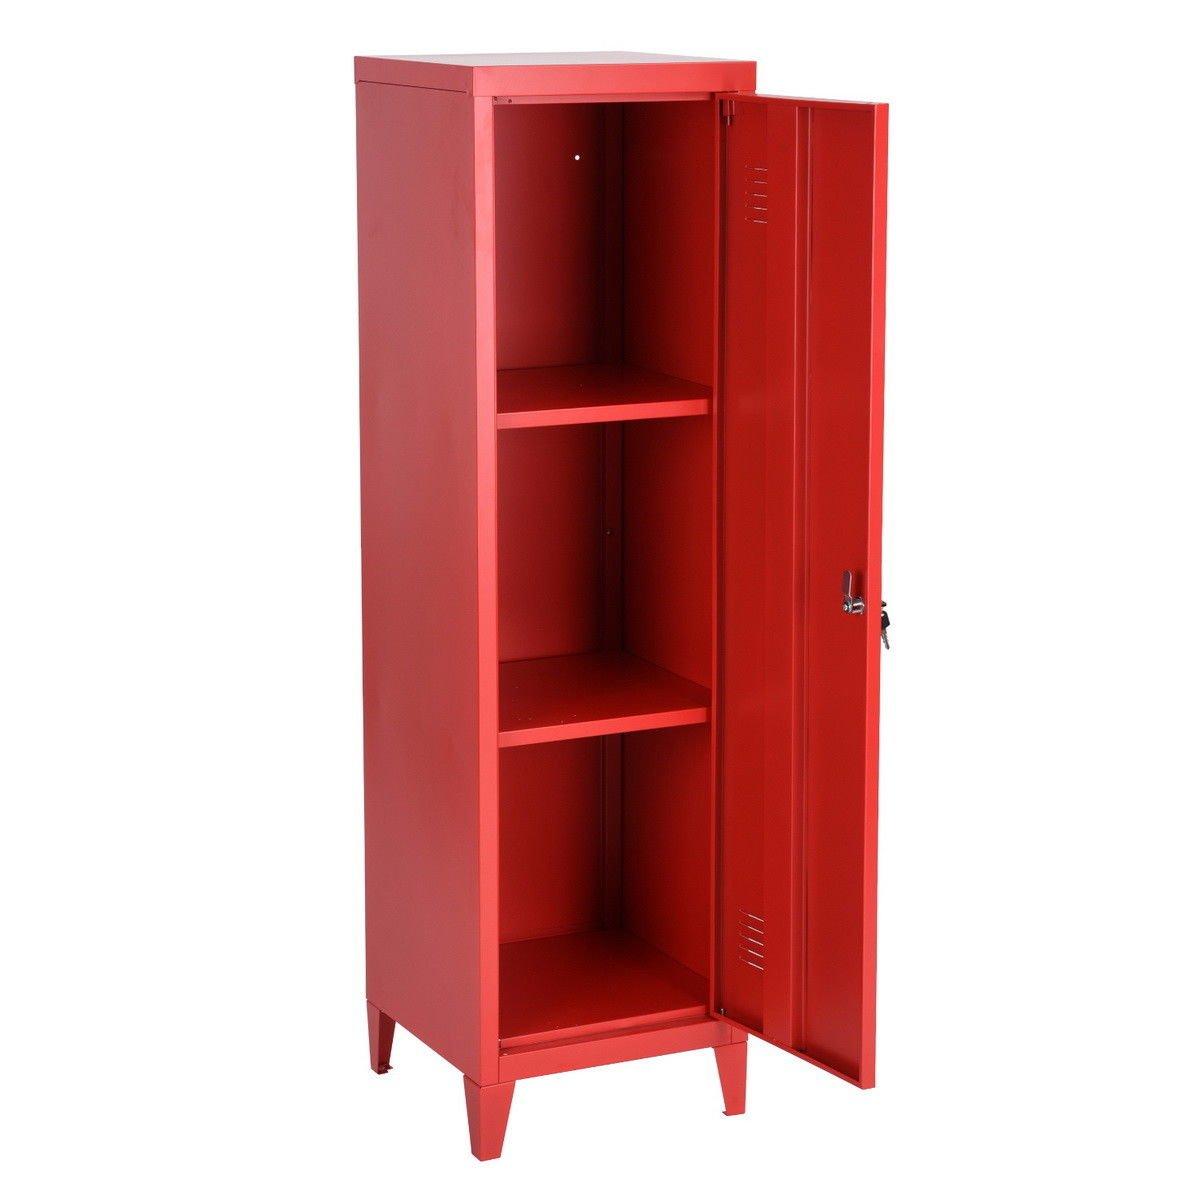 HouseinBox Office File Storage Metal Cabinet 3 Door Cupboard Locker Organizer Console Stand 3-in-1 (RED-Standing Locker) by HouseinBox